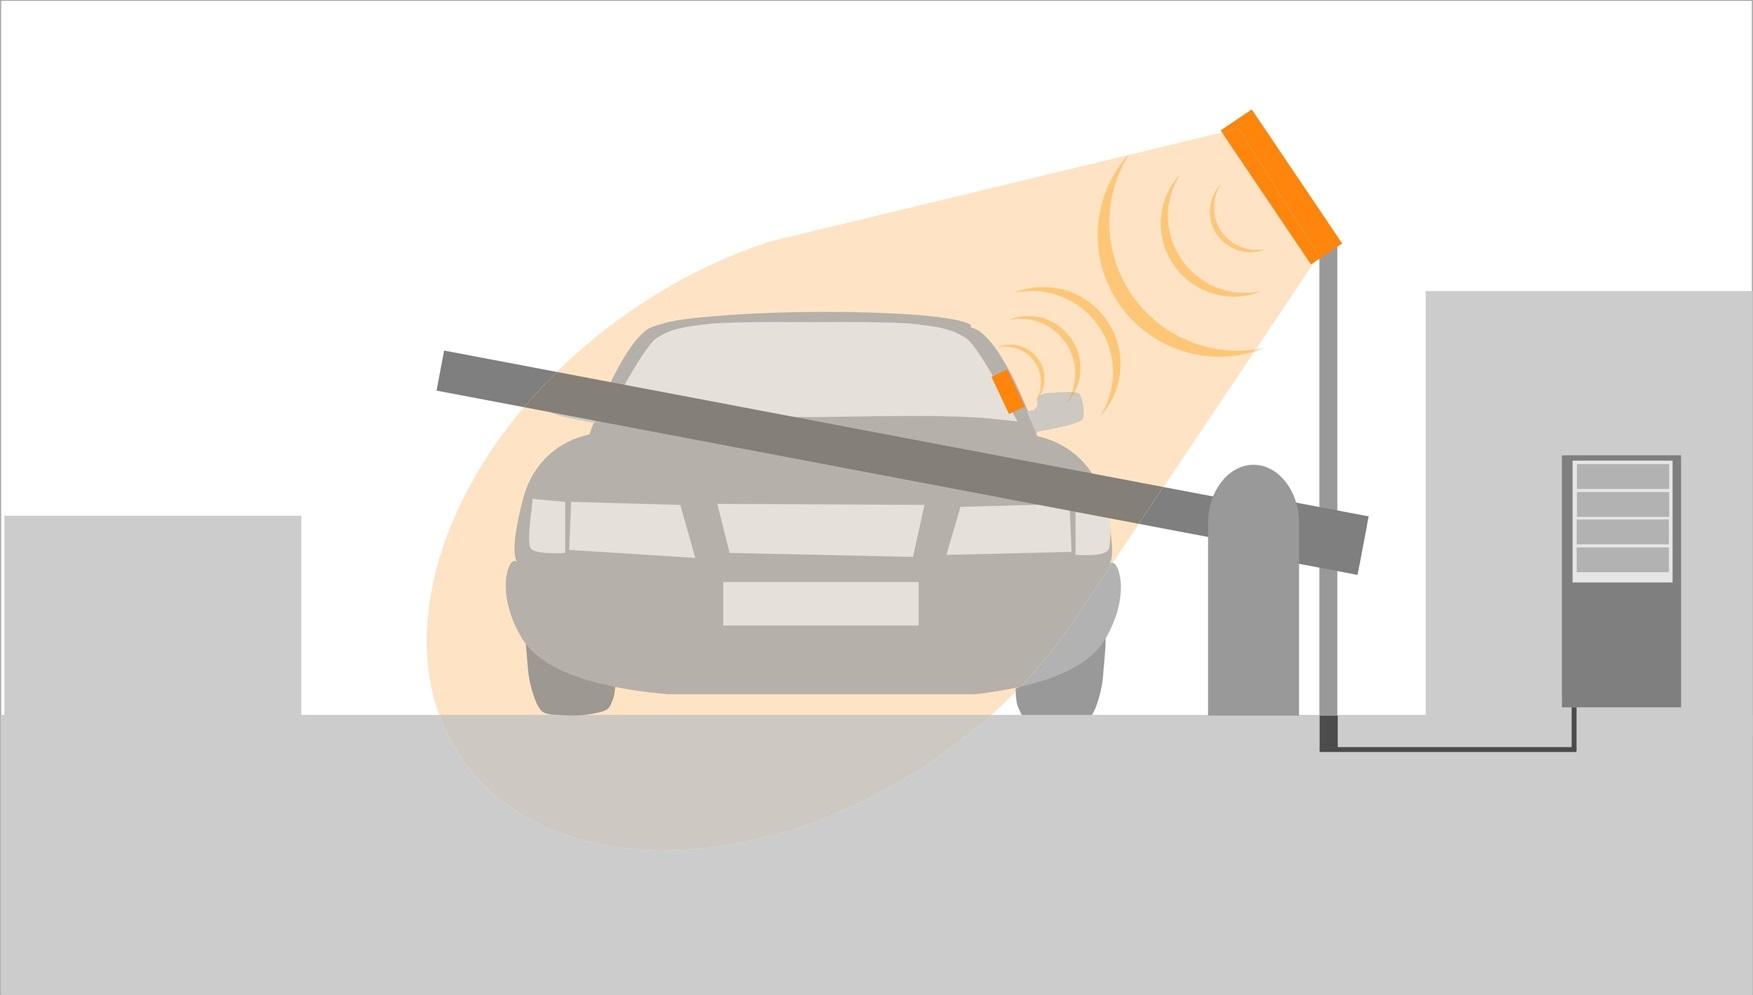 RFID метка на лобовое стекло автомобиля